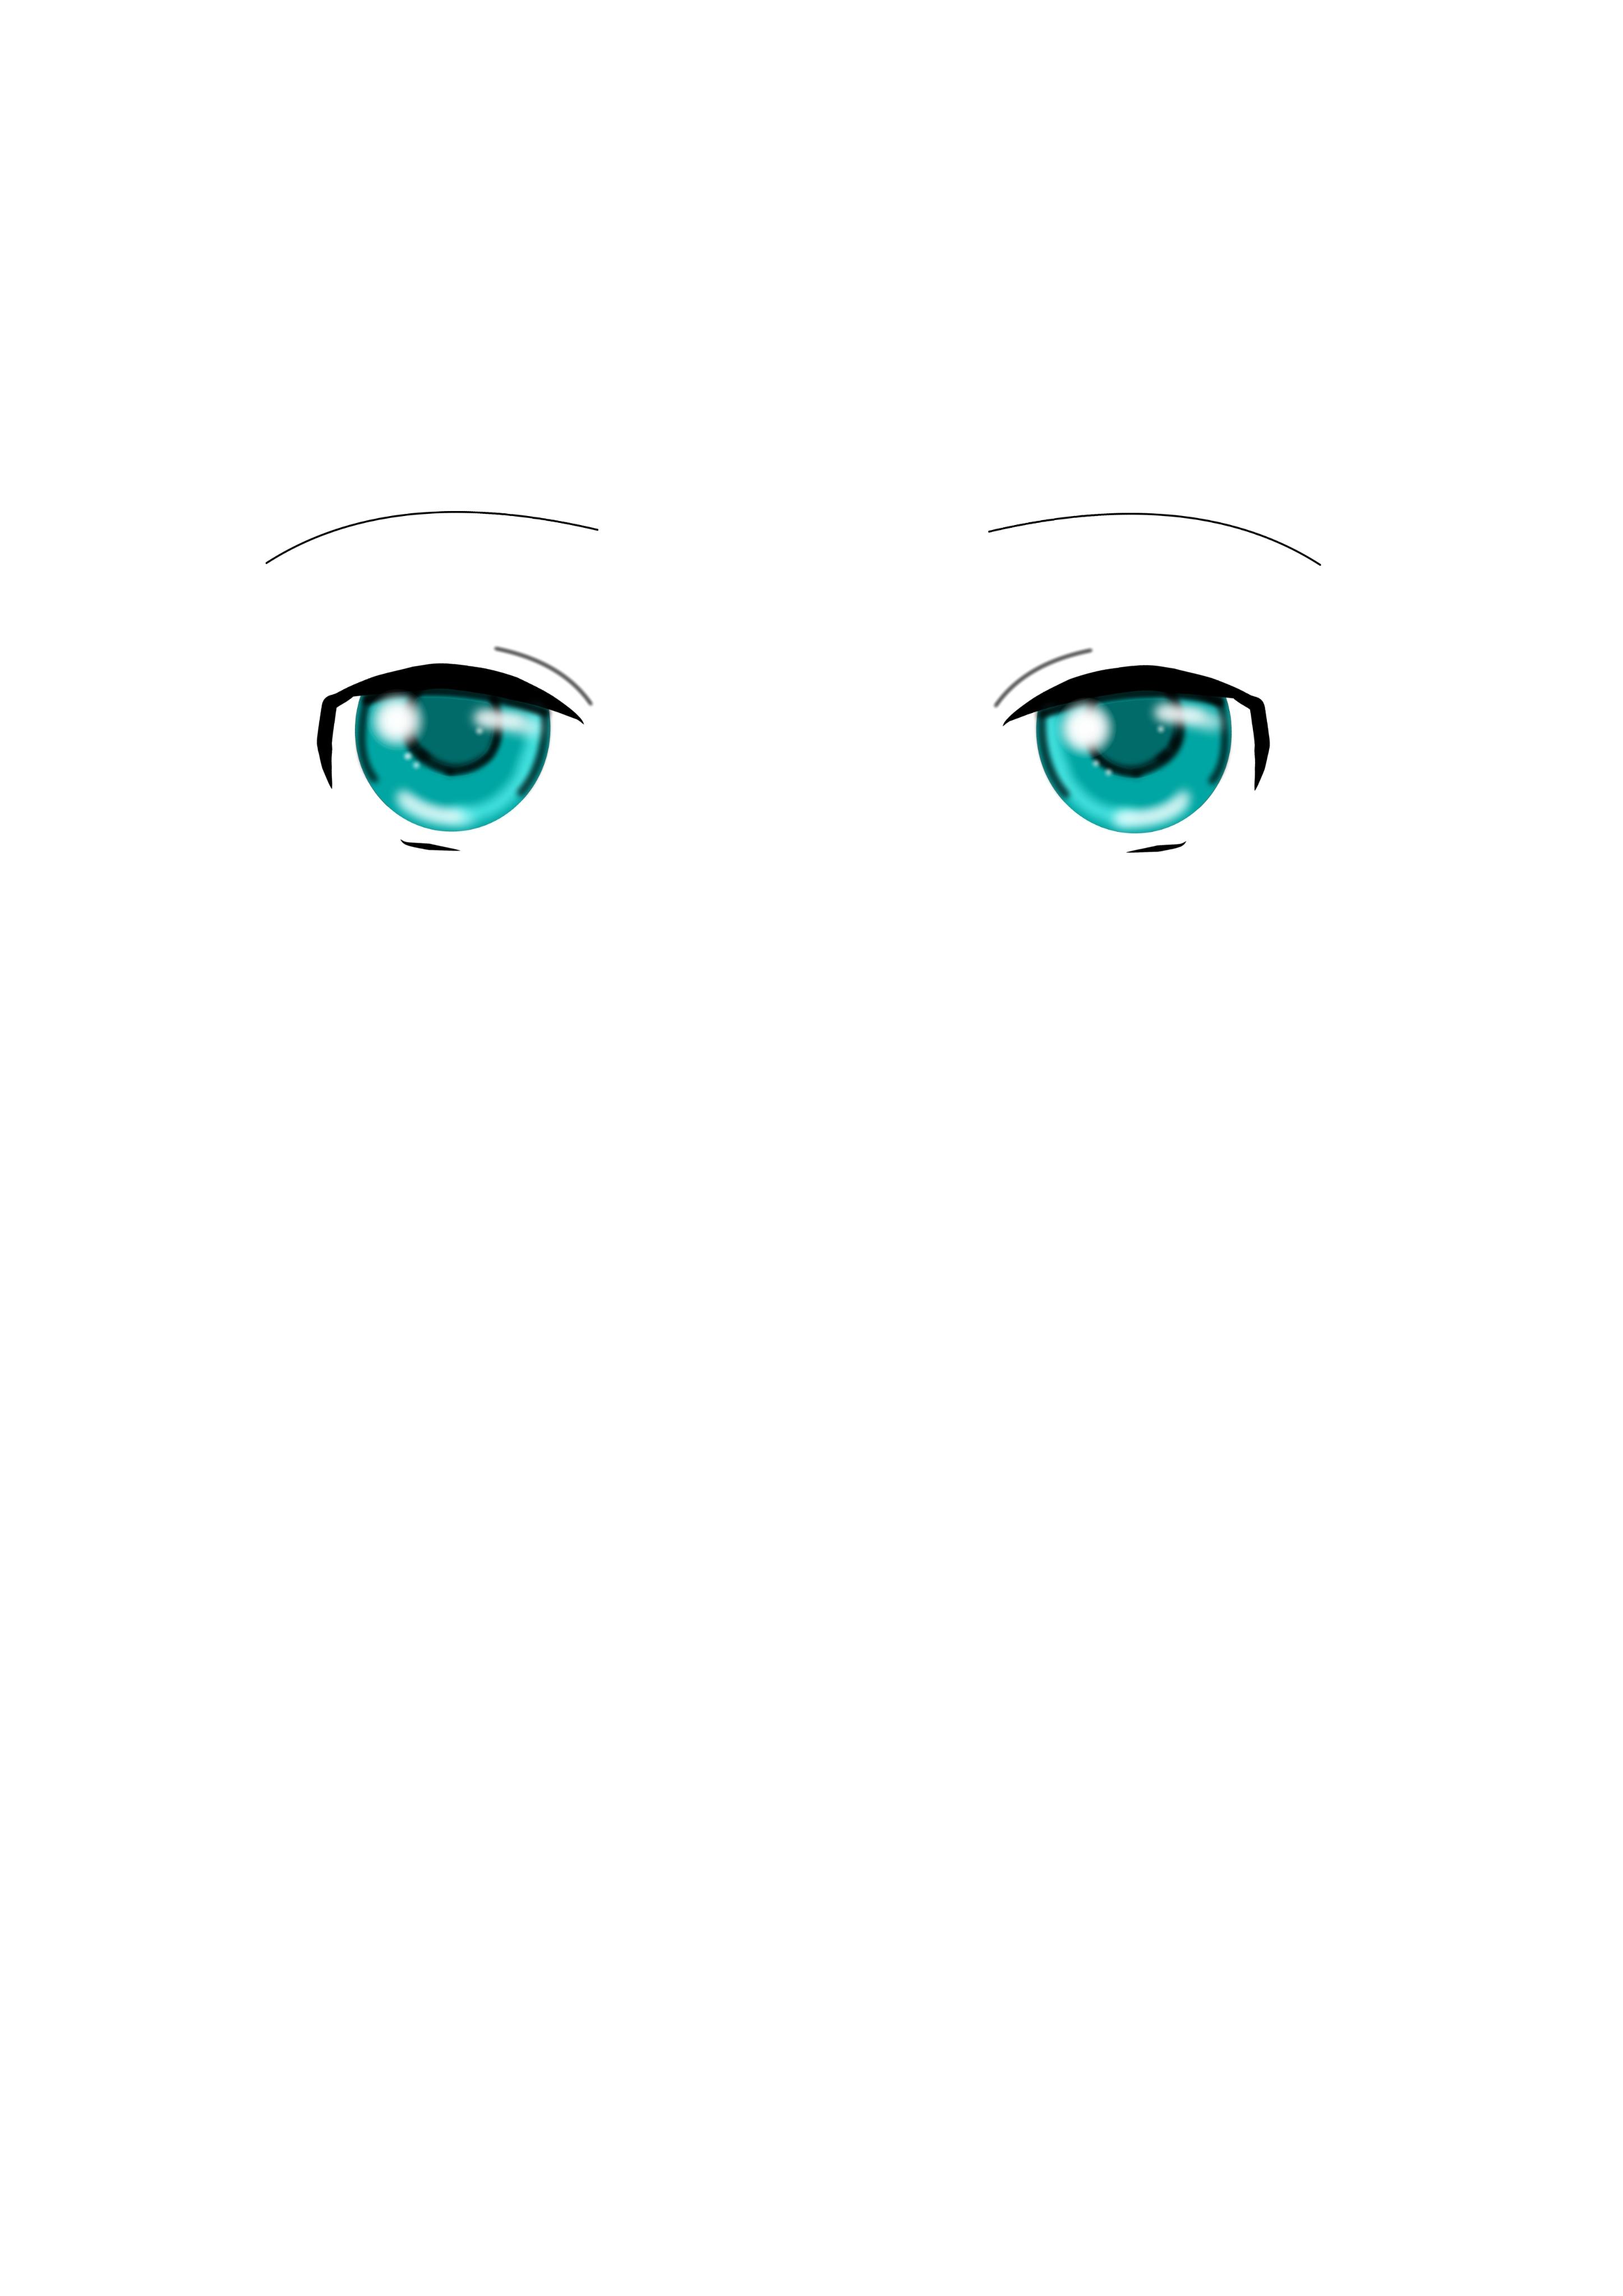 Manga Eyes v9.0